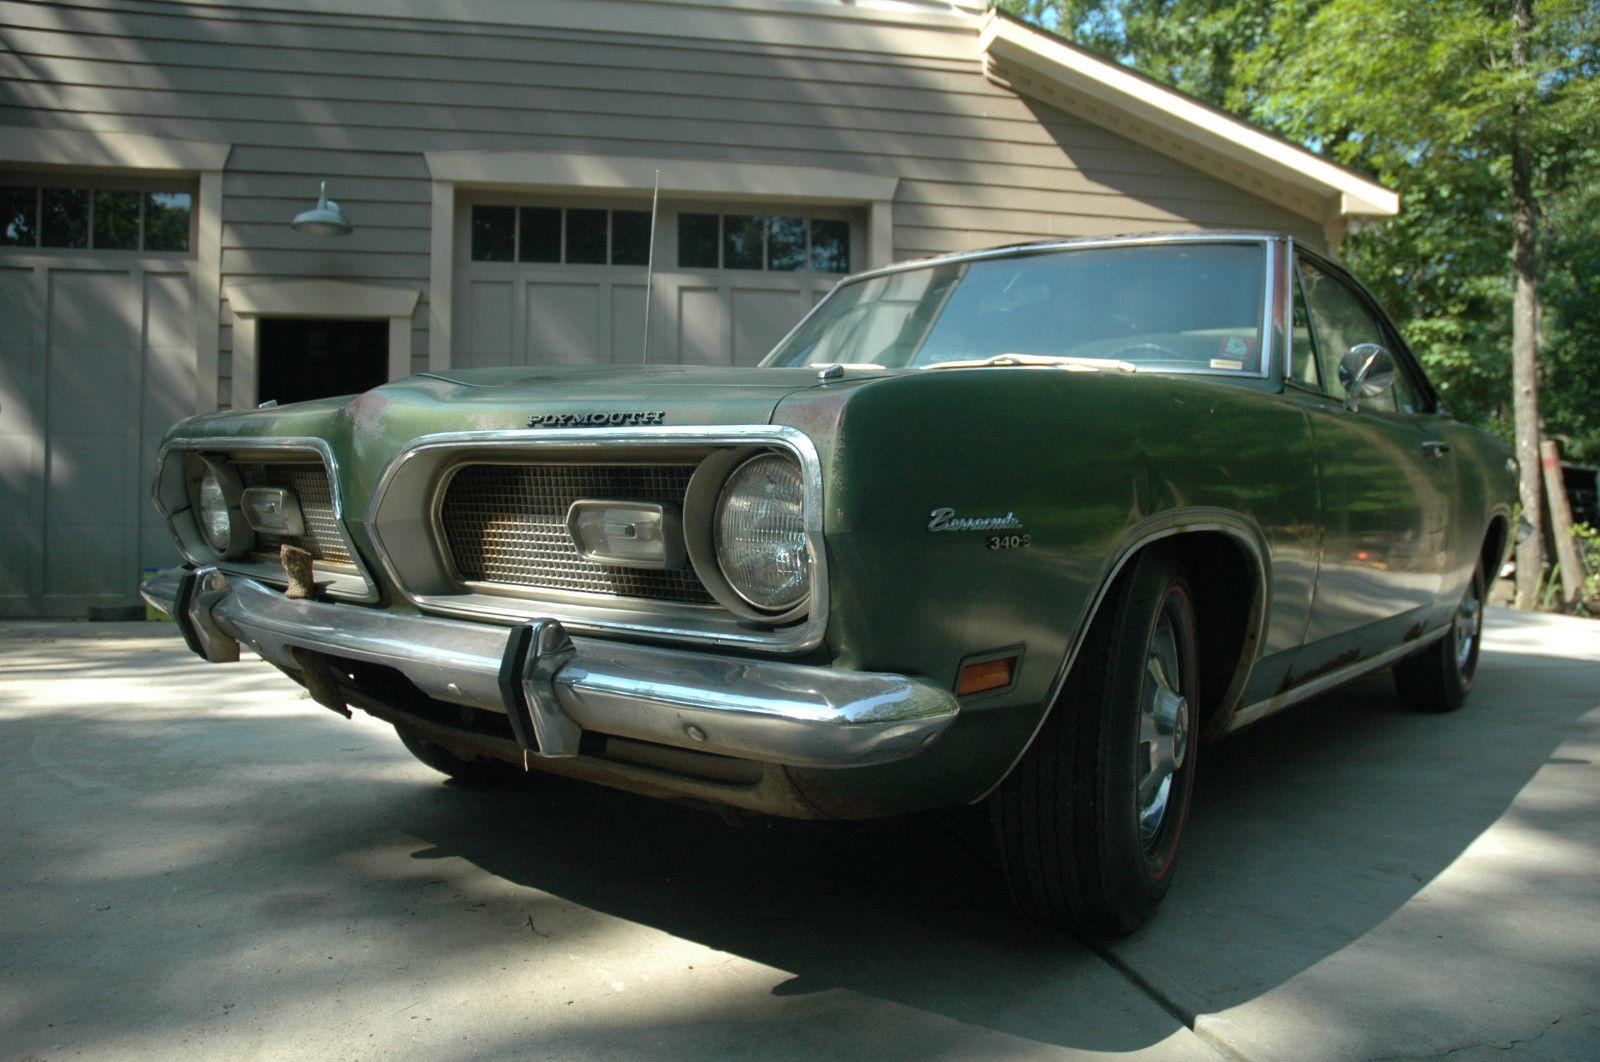 1969 Mod Top Barracuda Formula S on eBay | Mopar Blog